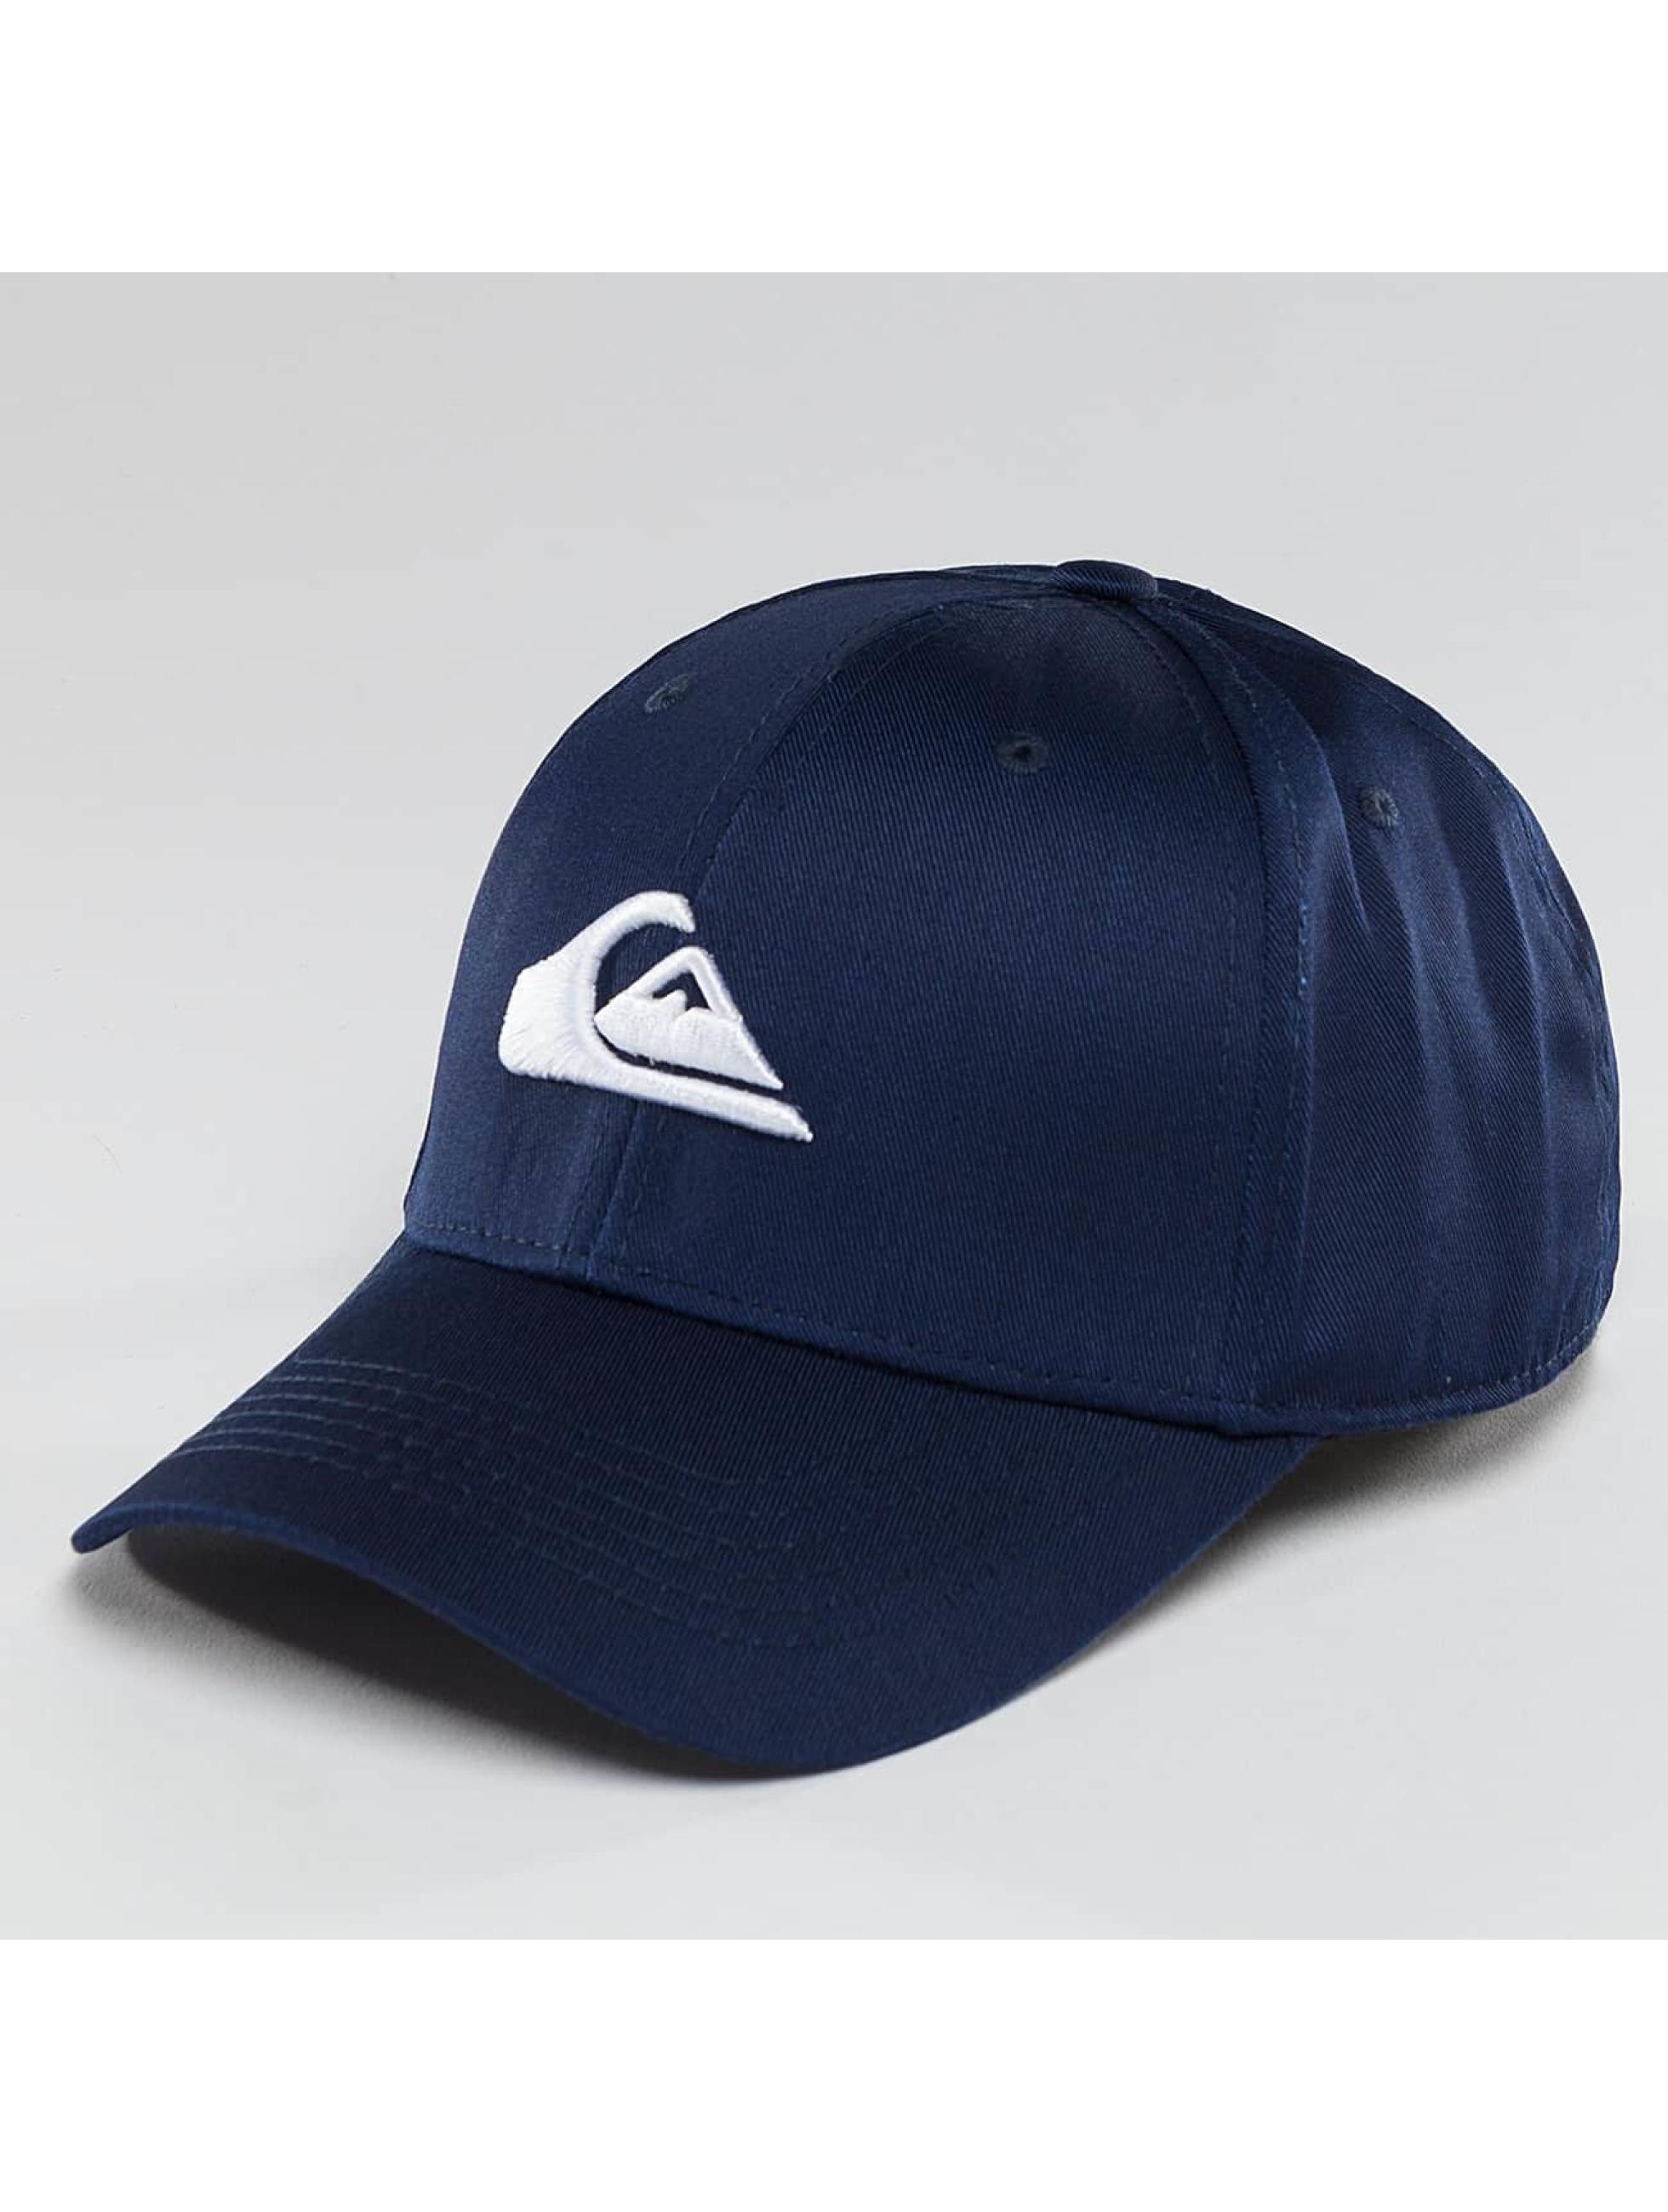 Quiksilver Gorra Snapback Decades azul